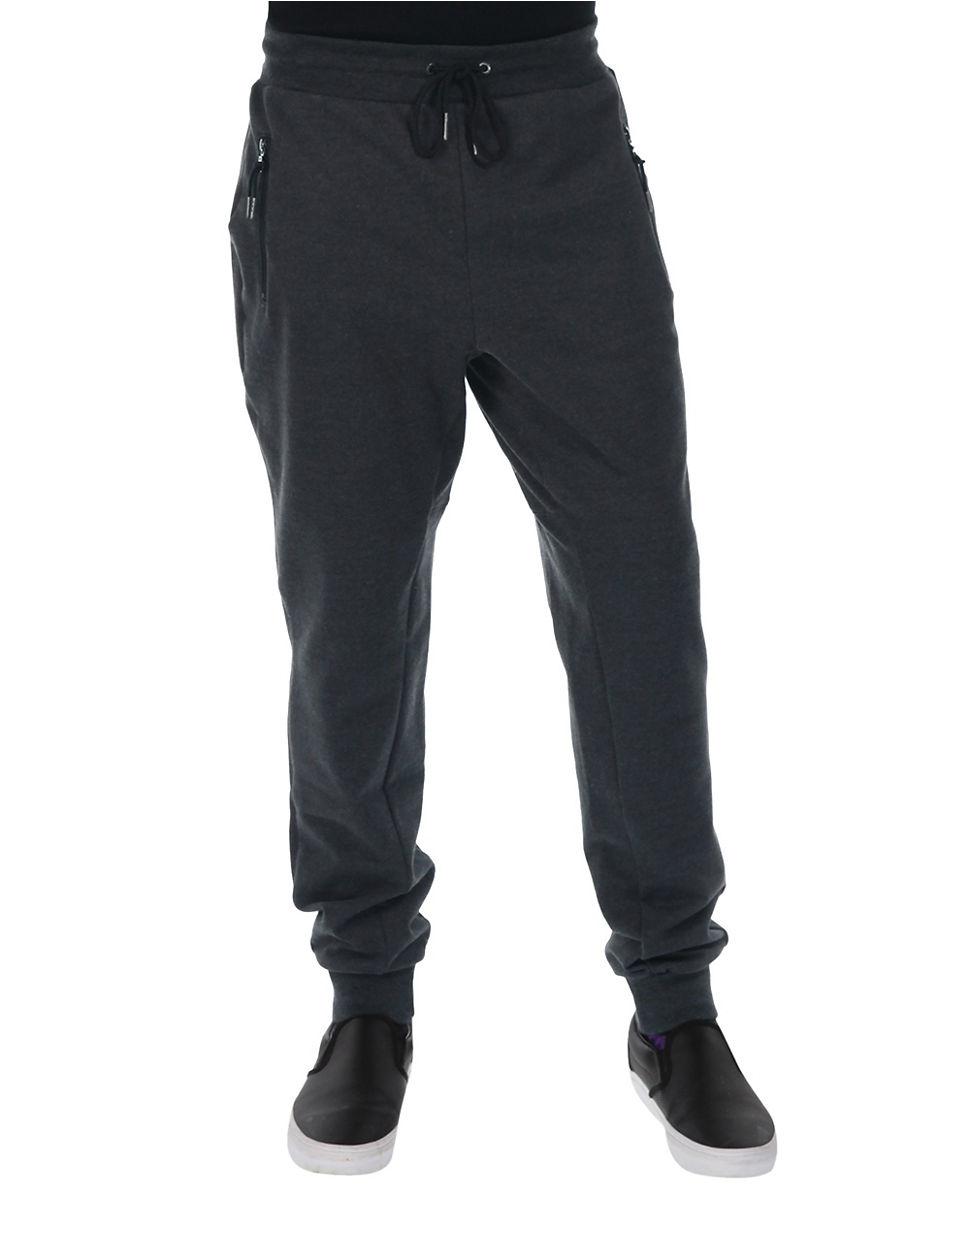 Cool Jogger Pants Bench Women With Beautiful Image | Sobatapk.com